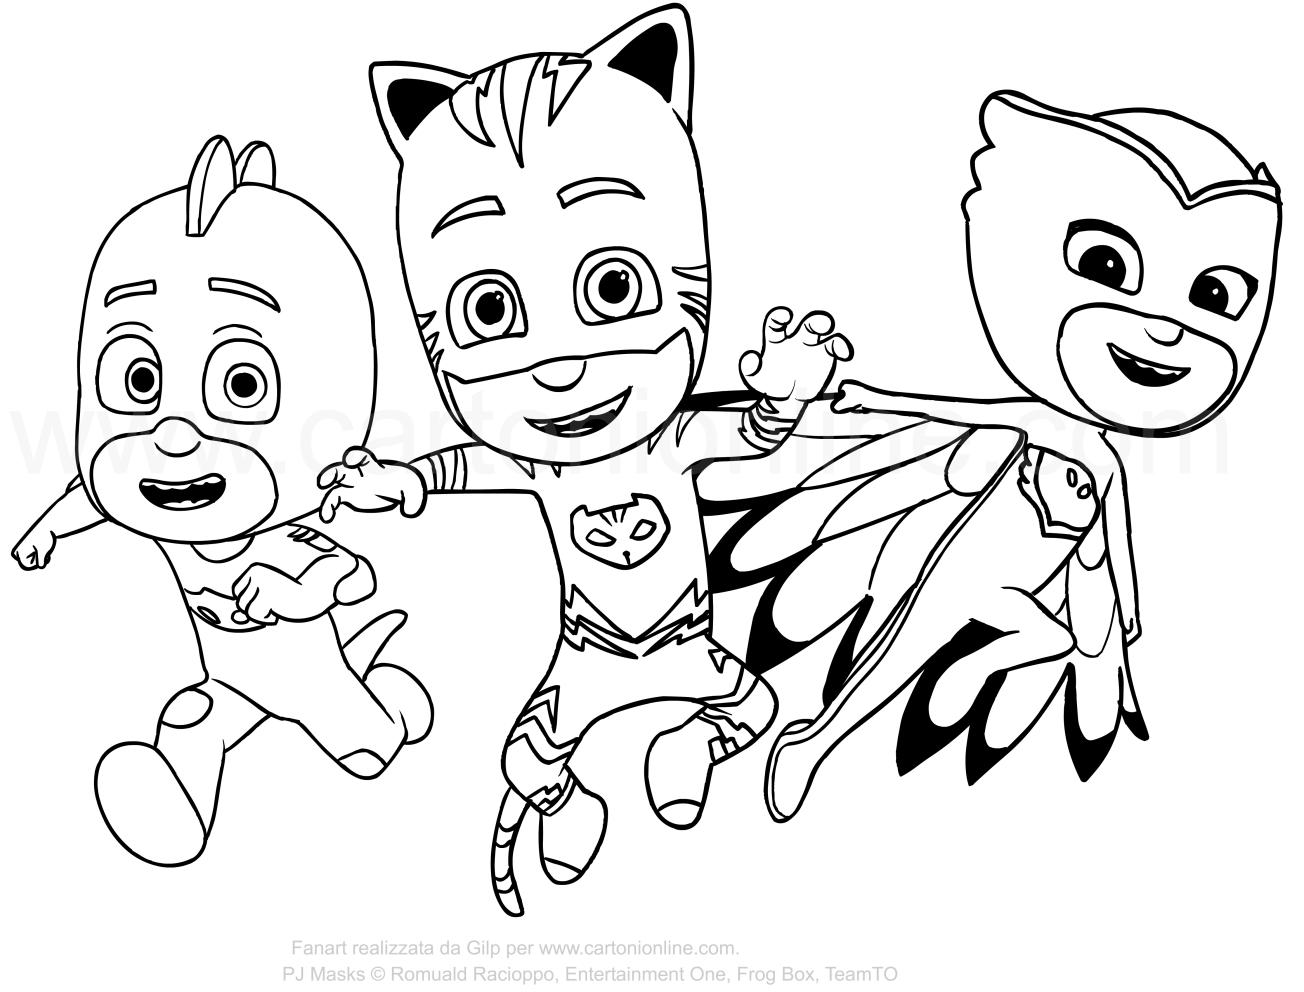 Kleurplaat van de PJ Masks - Super Pyjamas